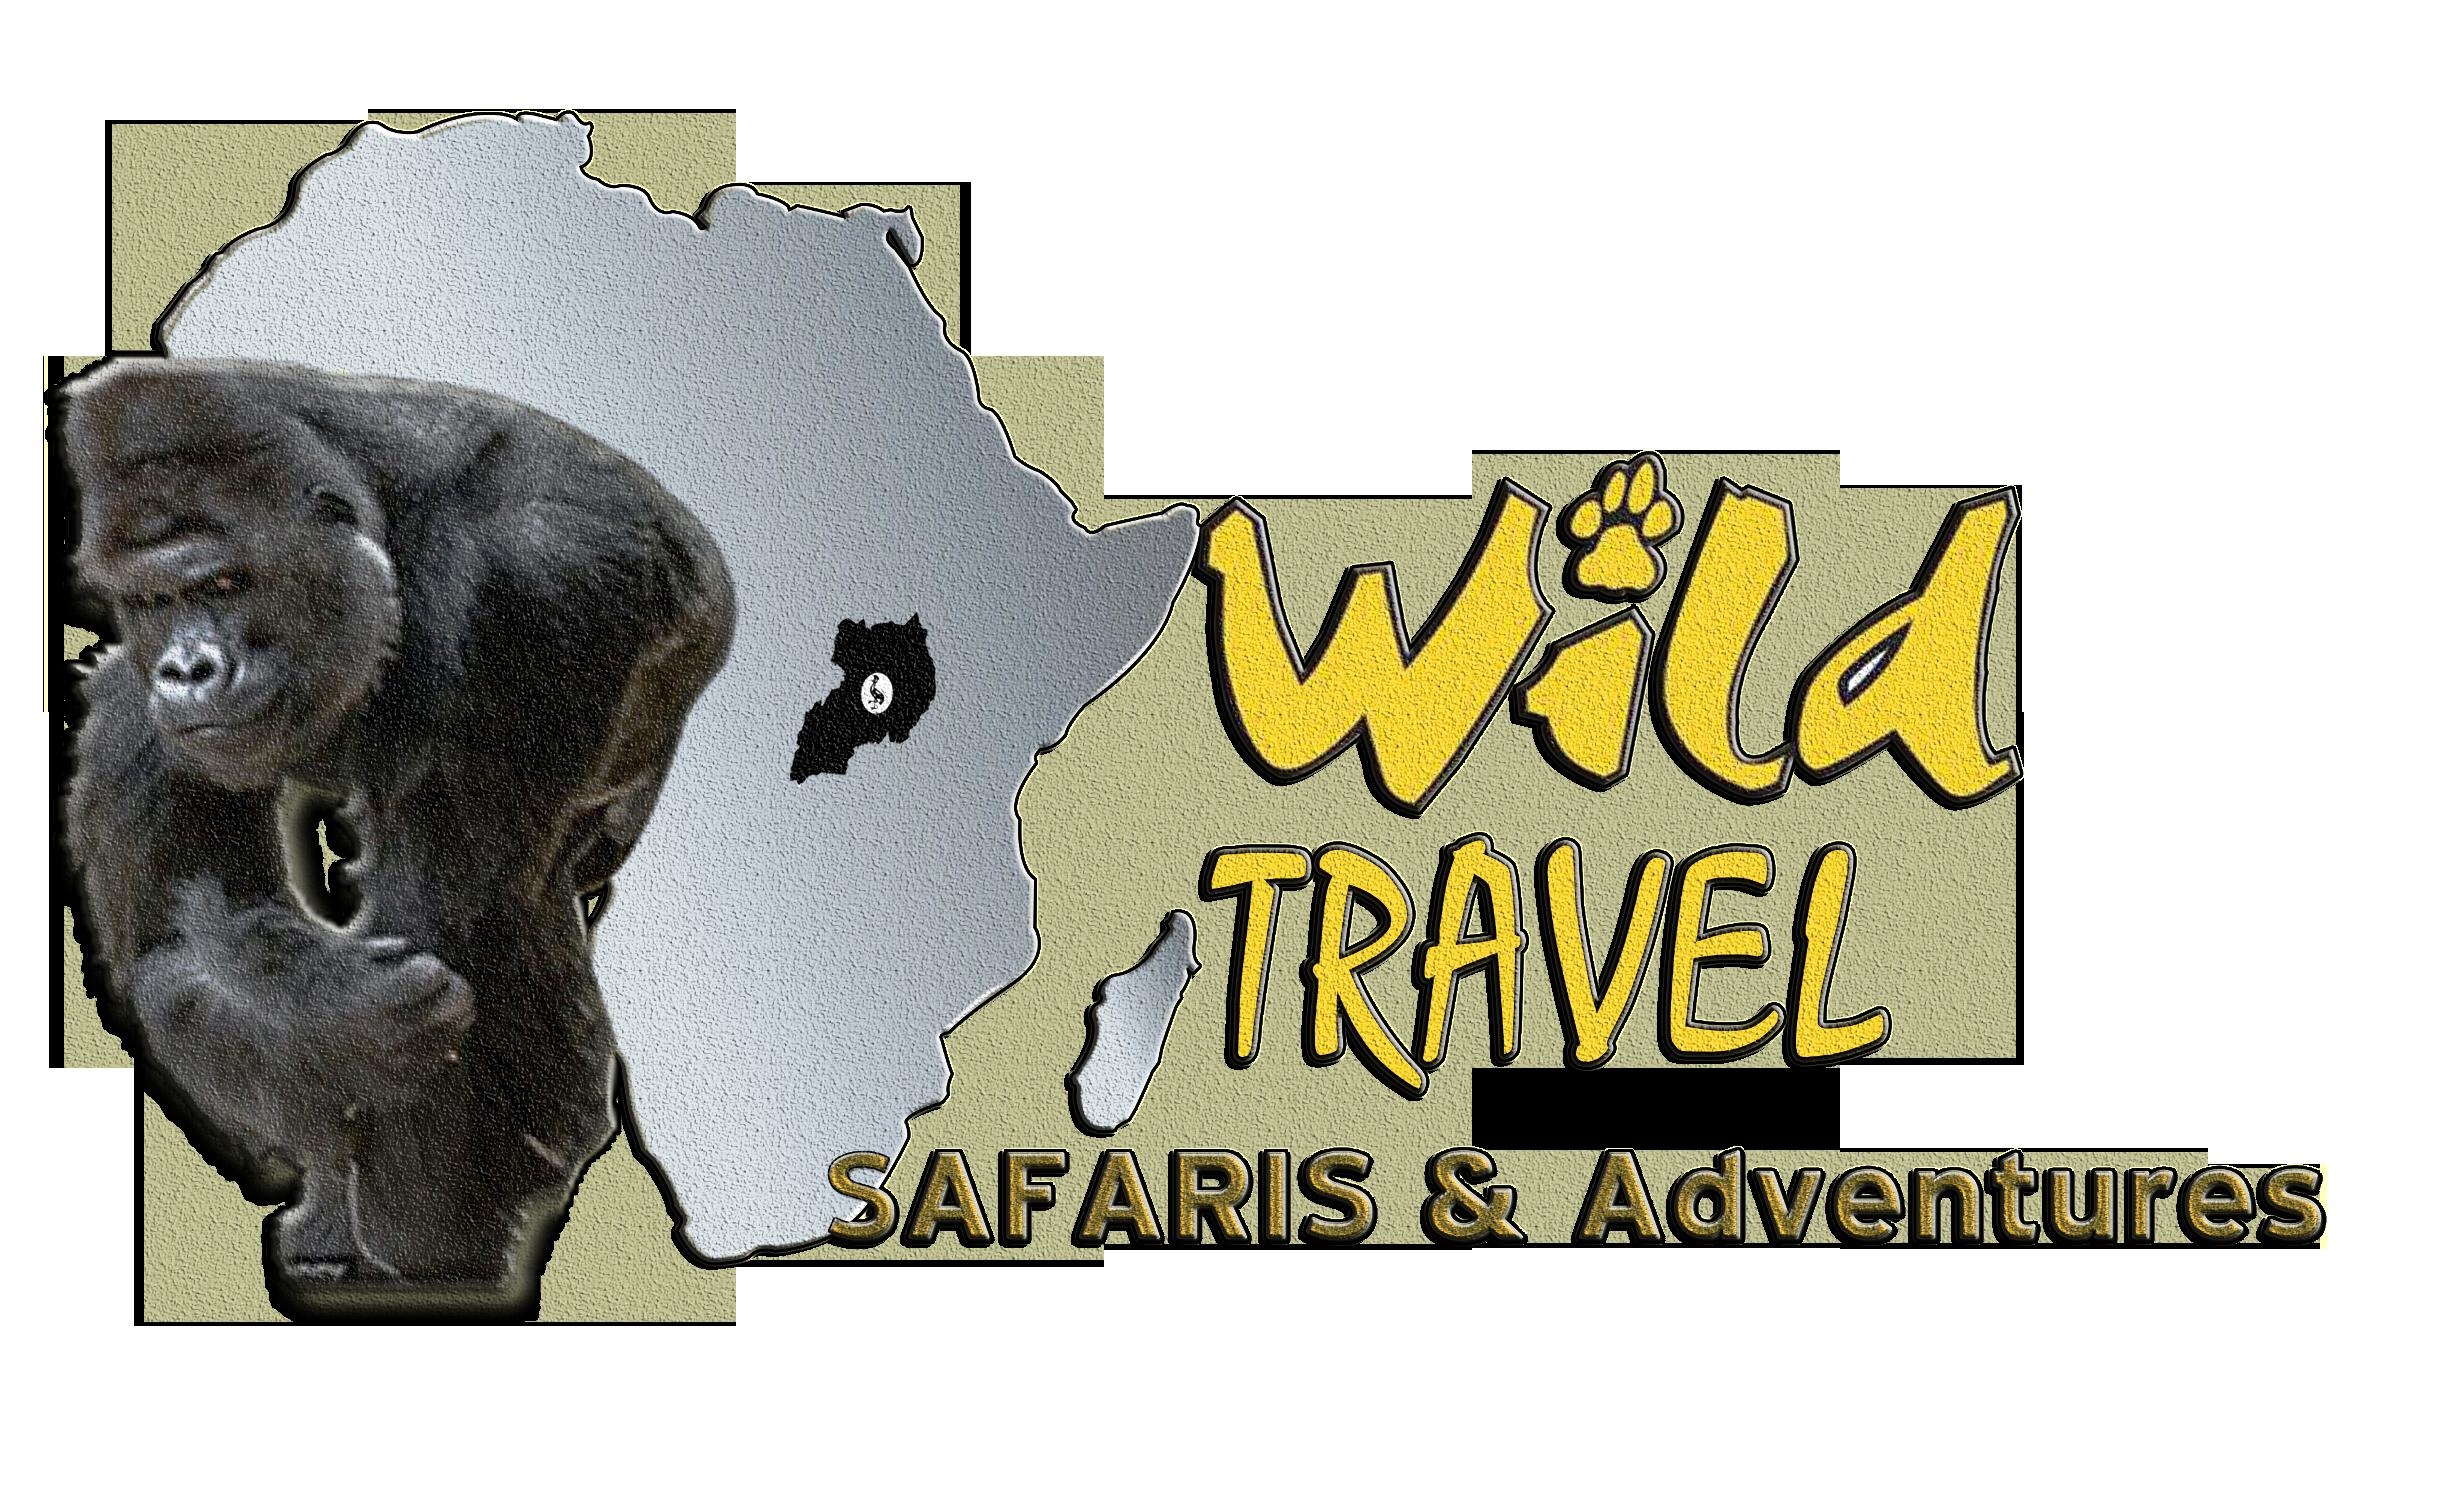 Wild Travel Safaris